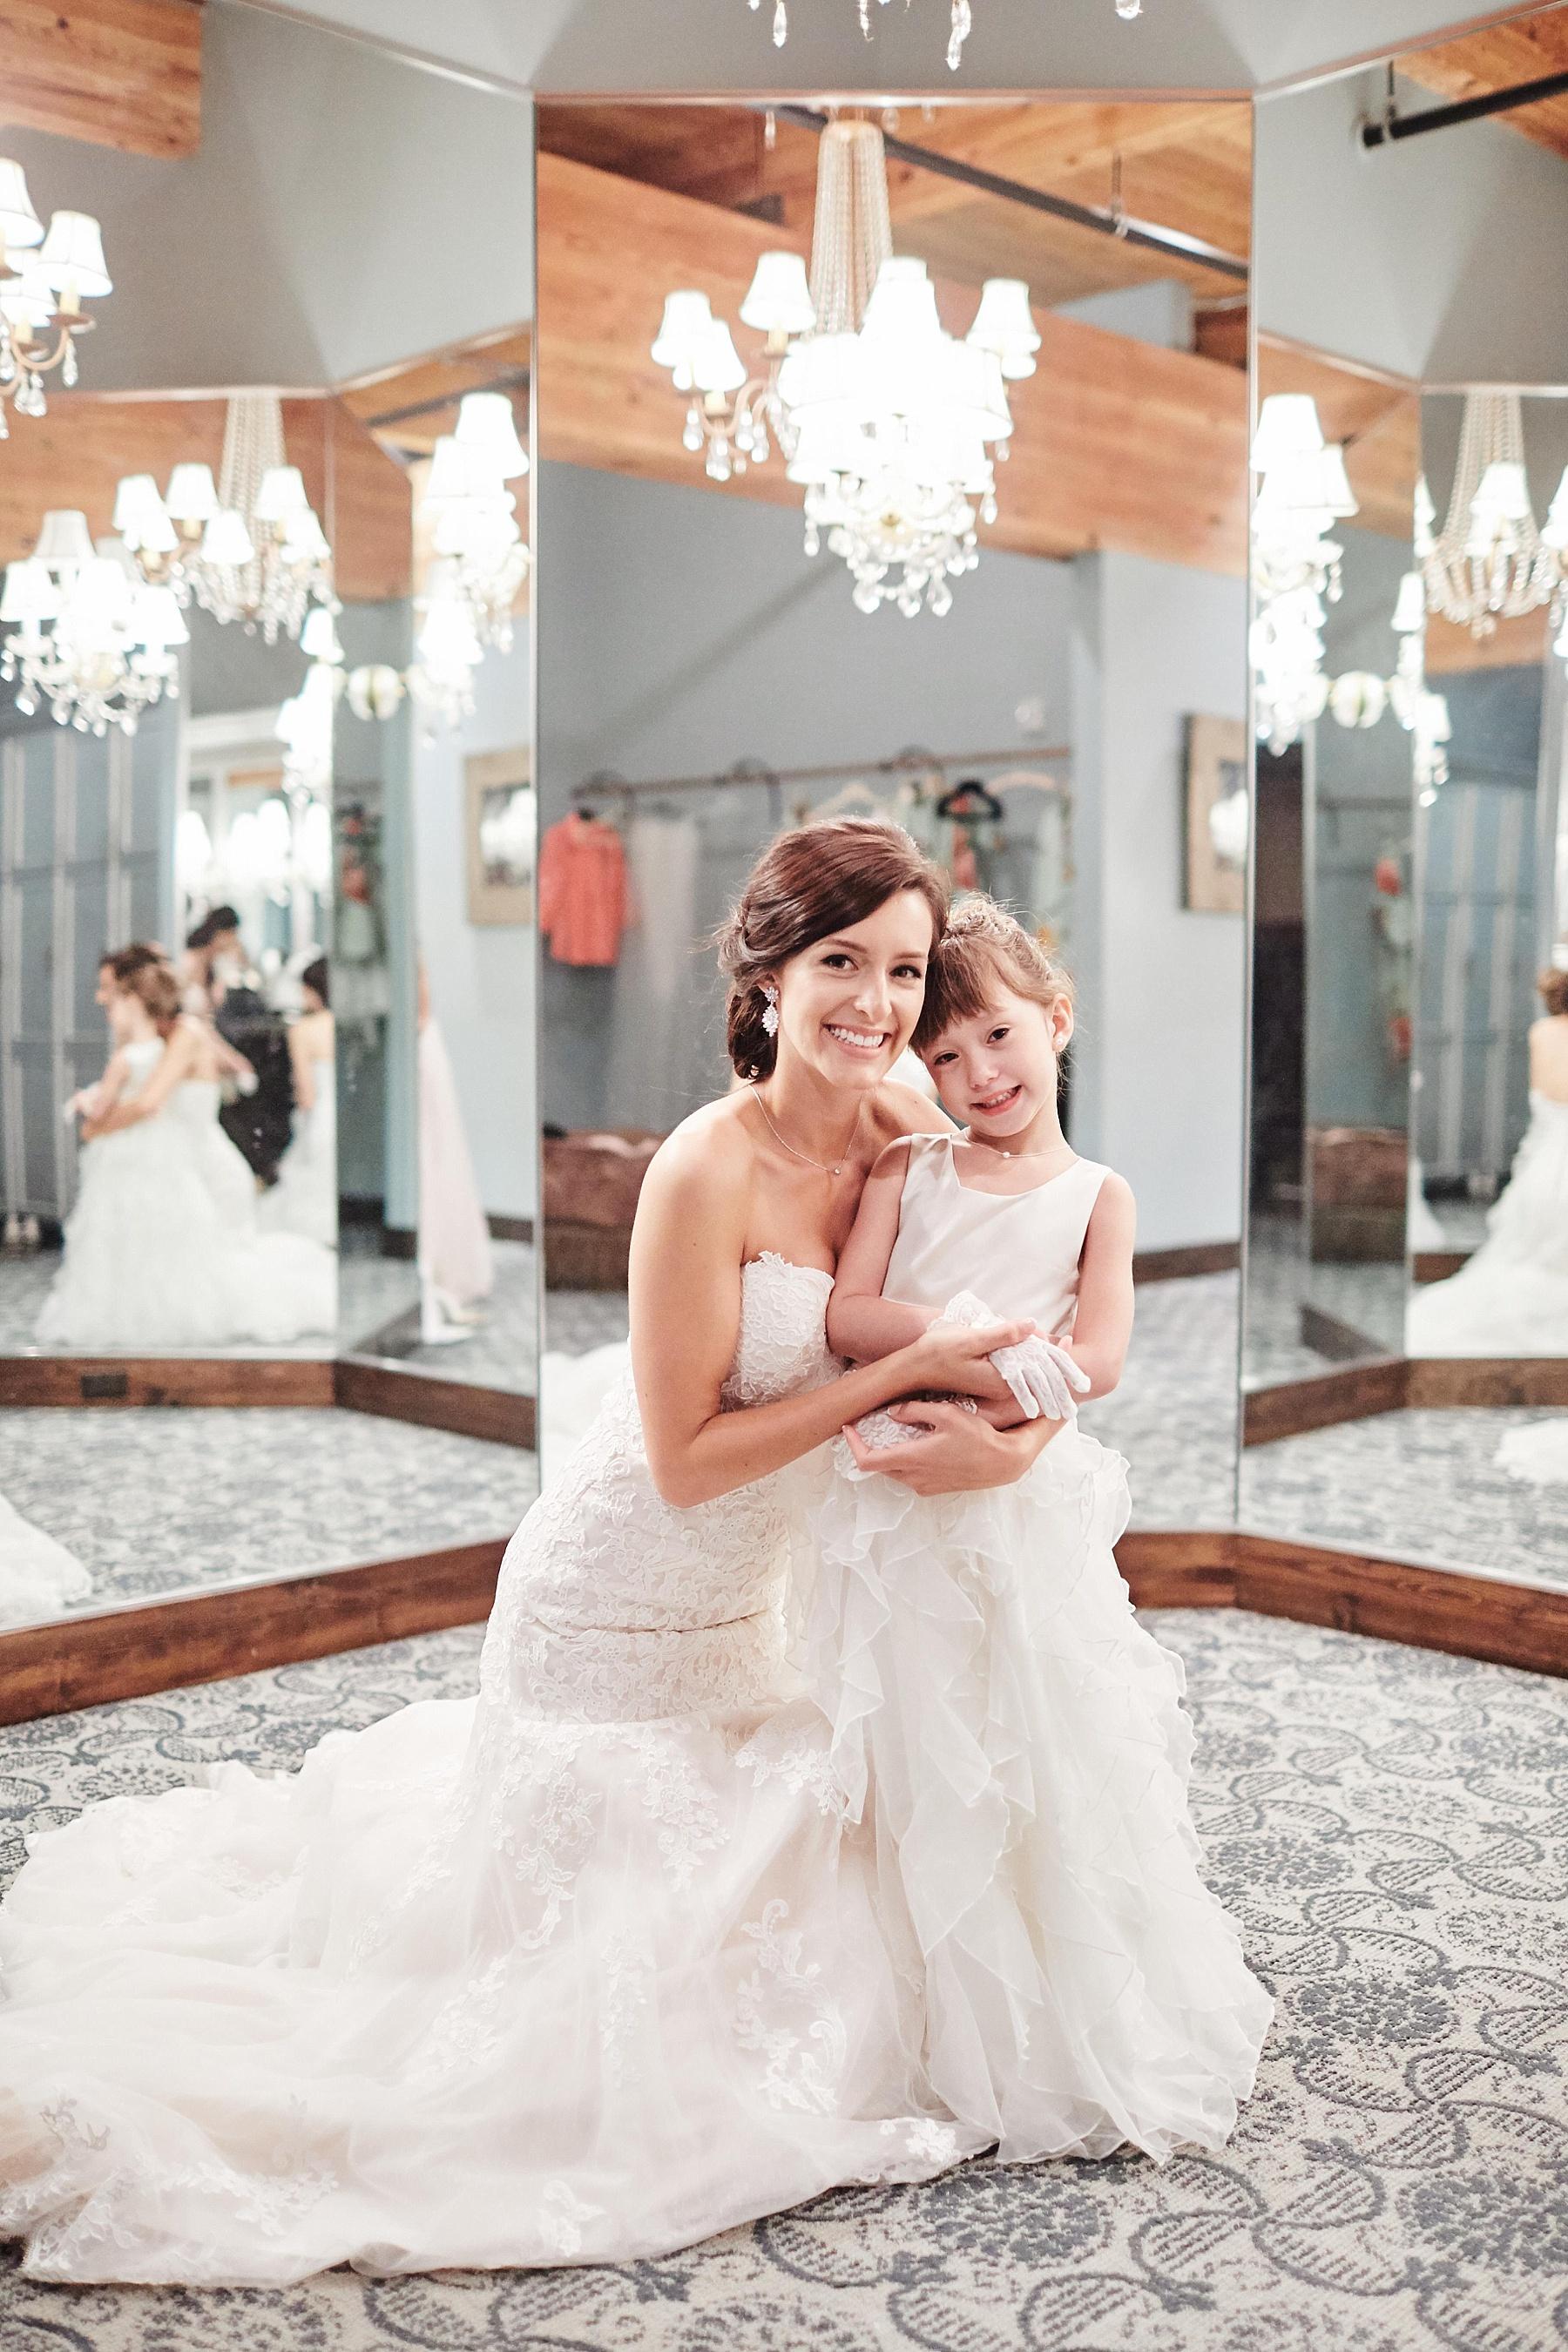 ABULAE-Wedding-Saint-paul-MN-Josh-Sofia-Wedding-Mears-Park_0734.jpg